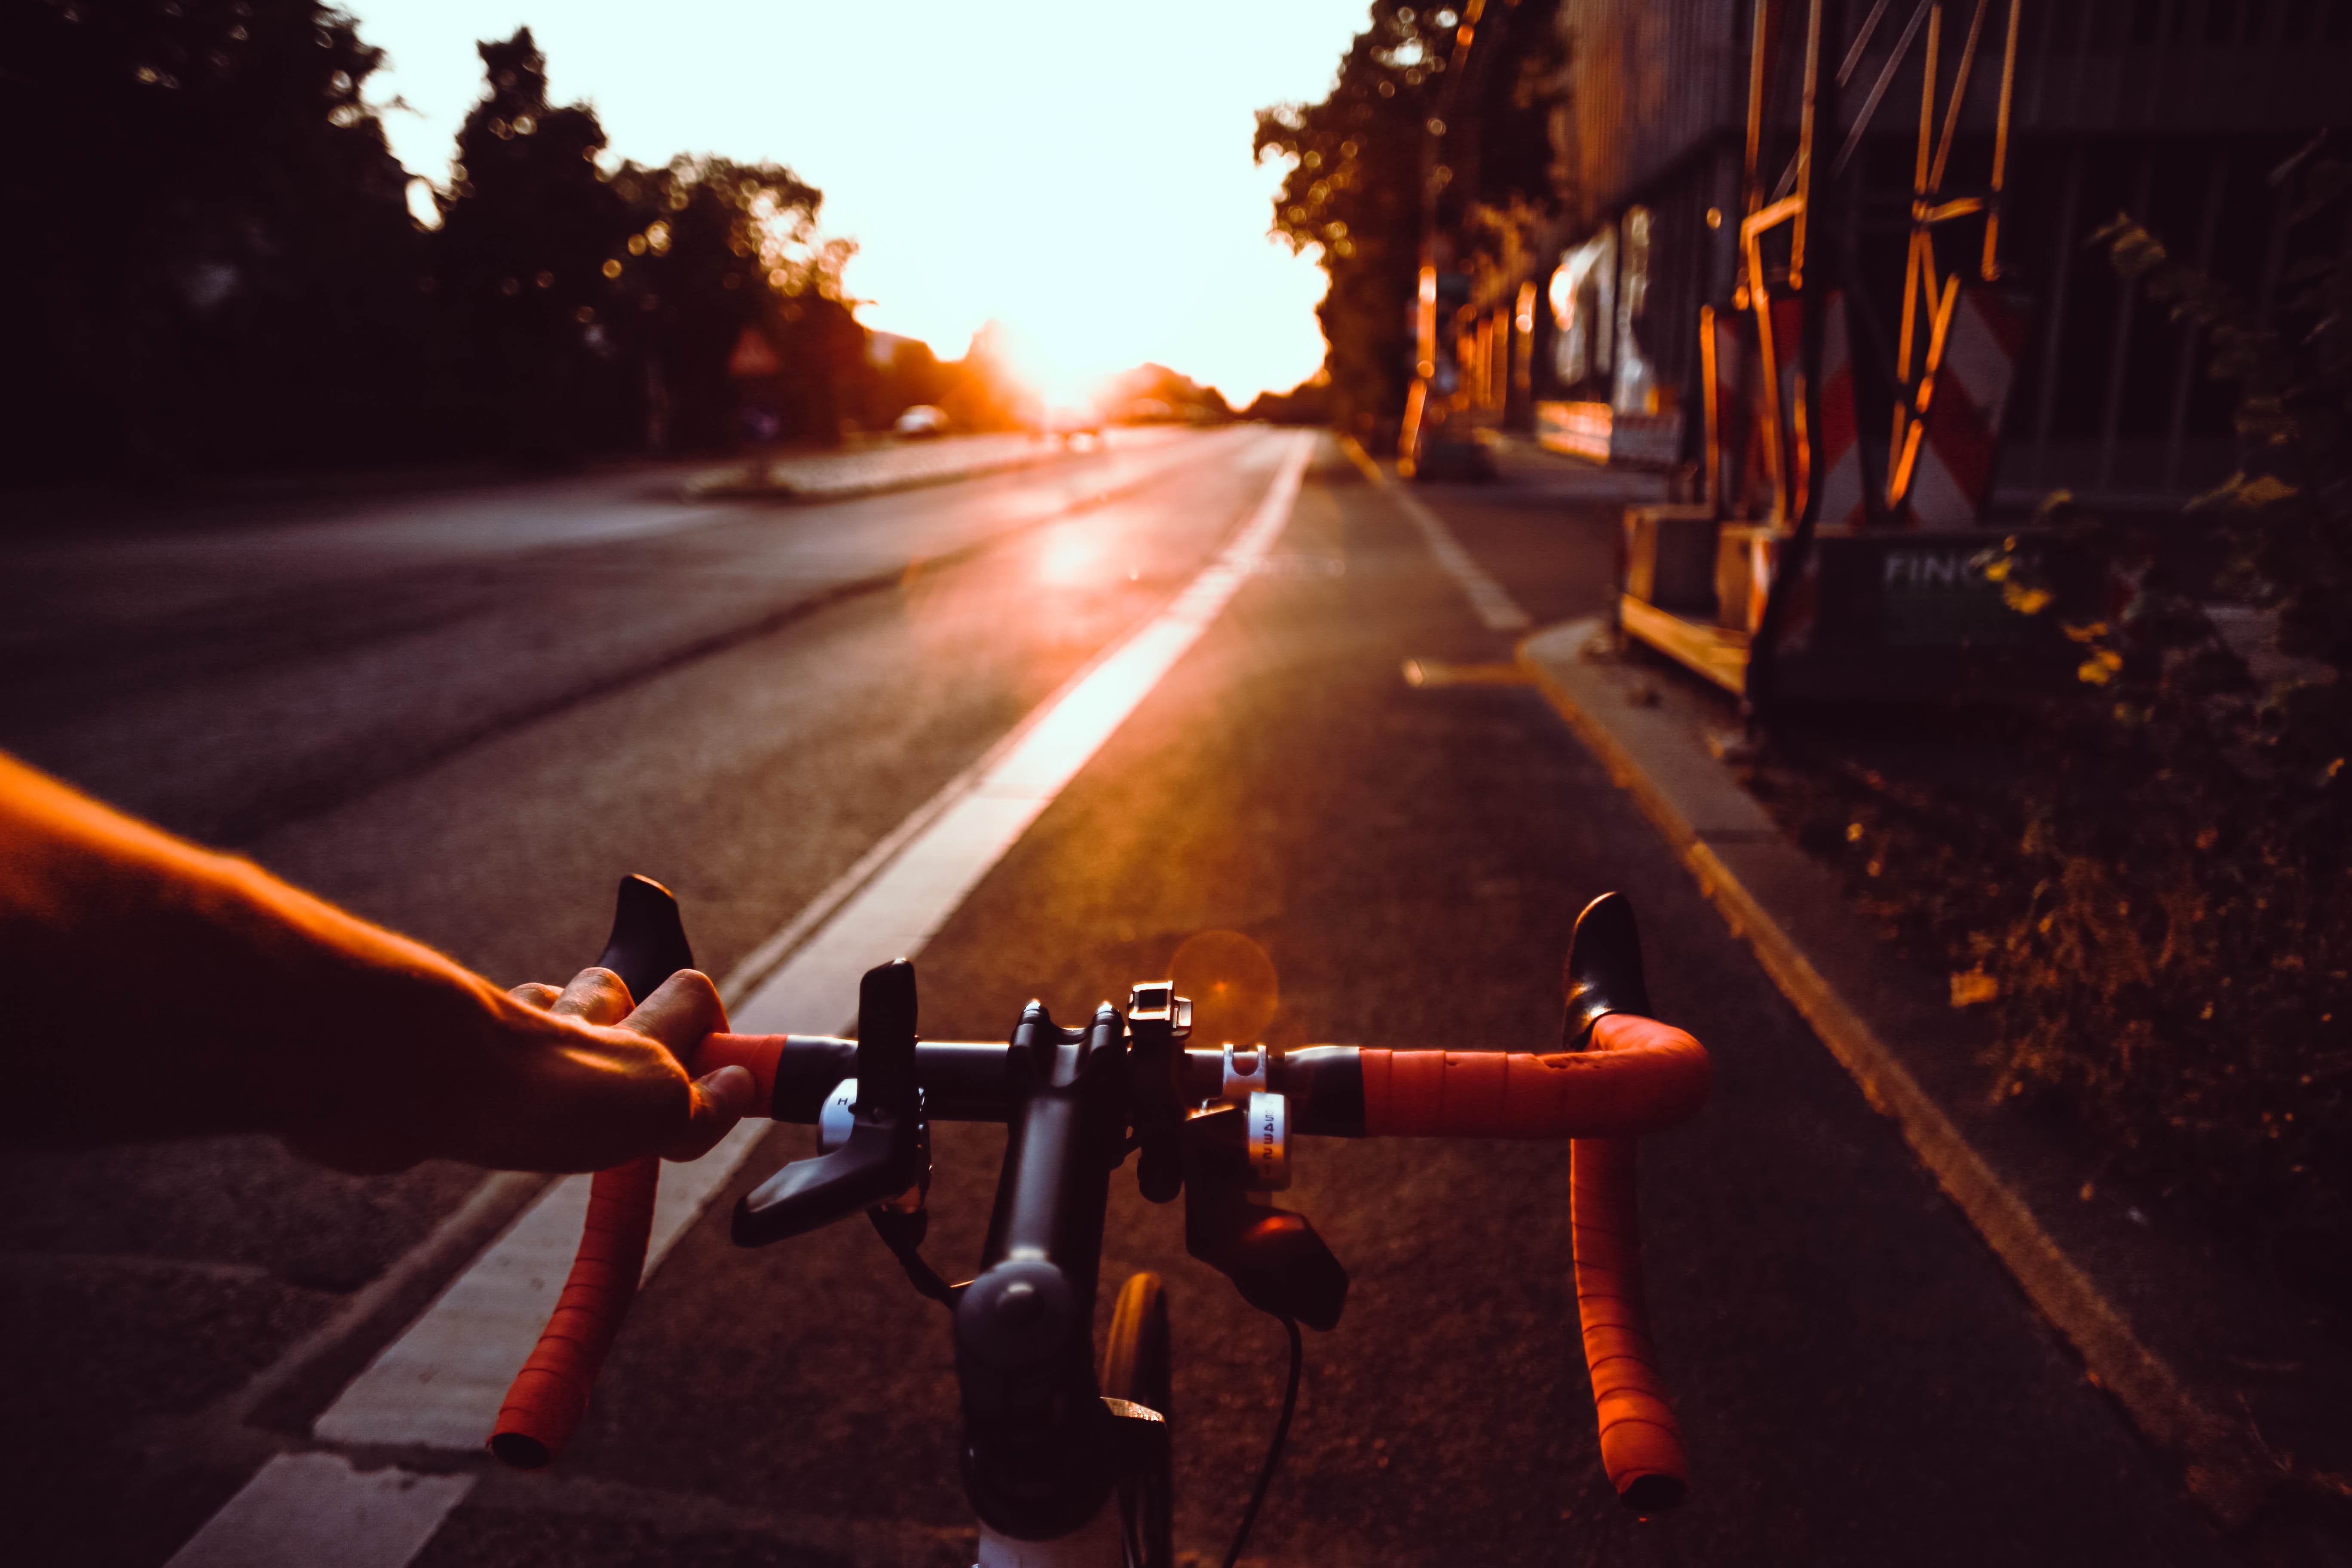 kerékpár spriccel